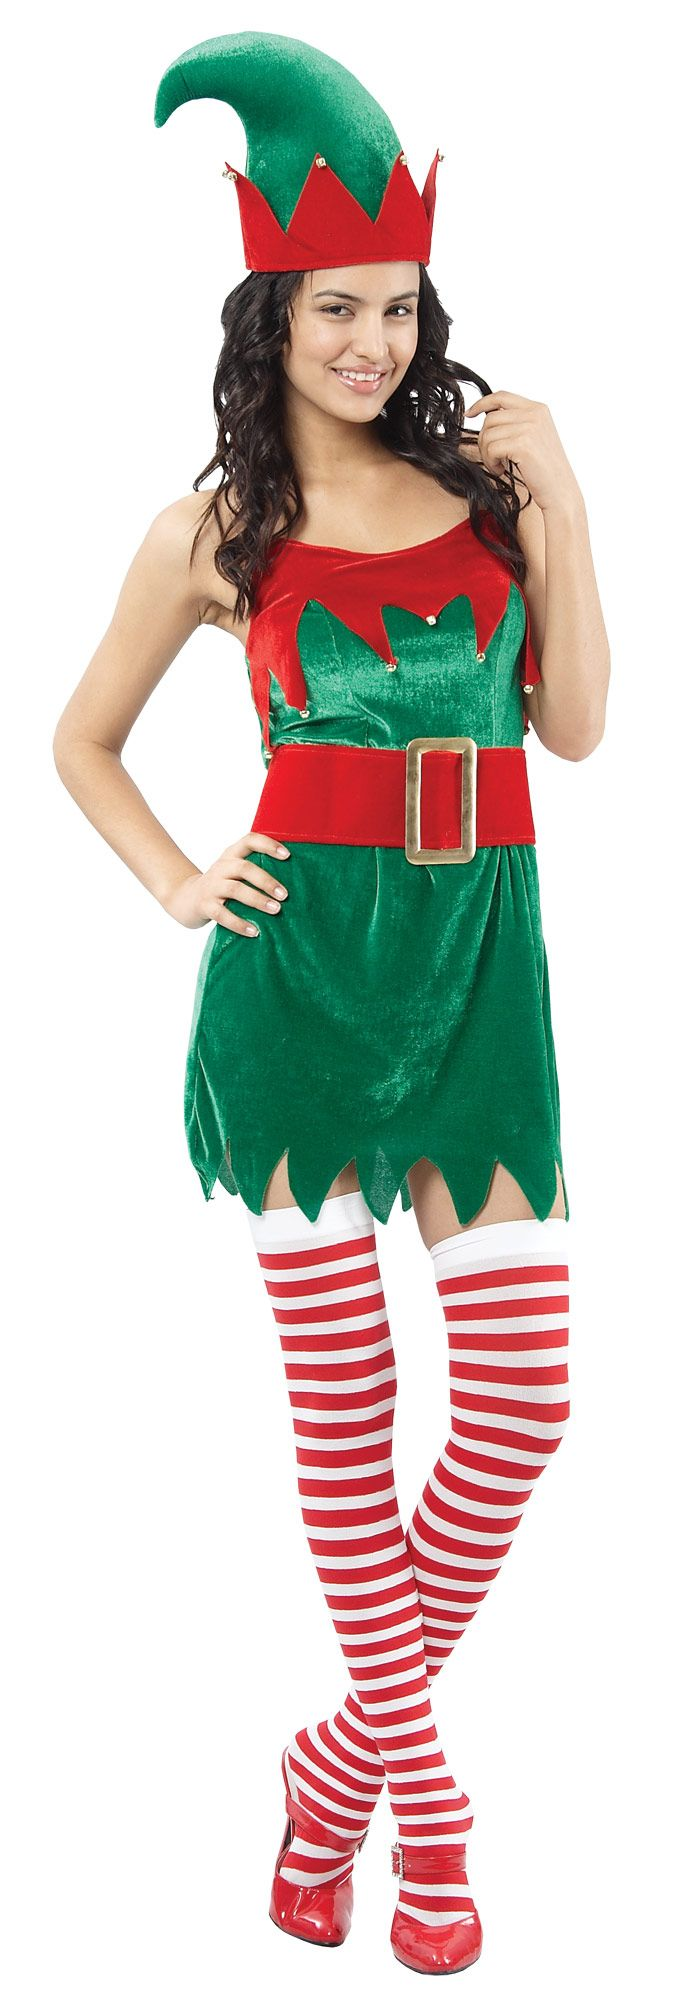 Costume elfo di Natale donna http://www.vegaoo.it/costume-elfo-di-natale-donna.html